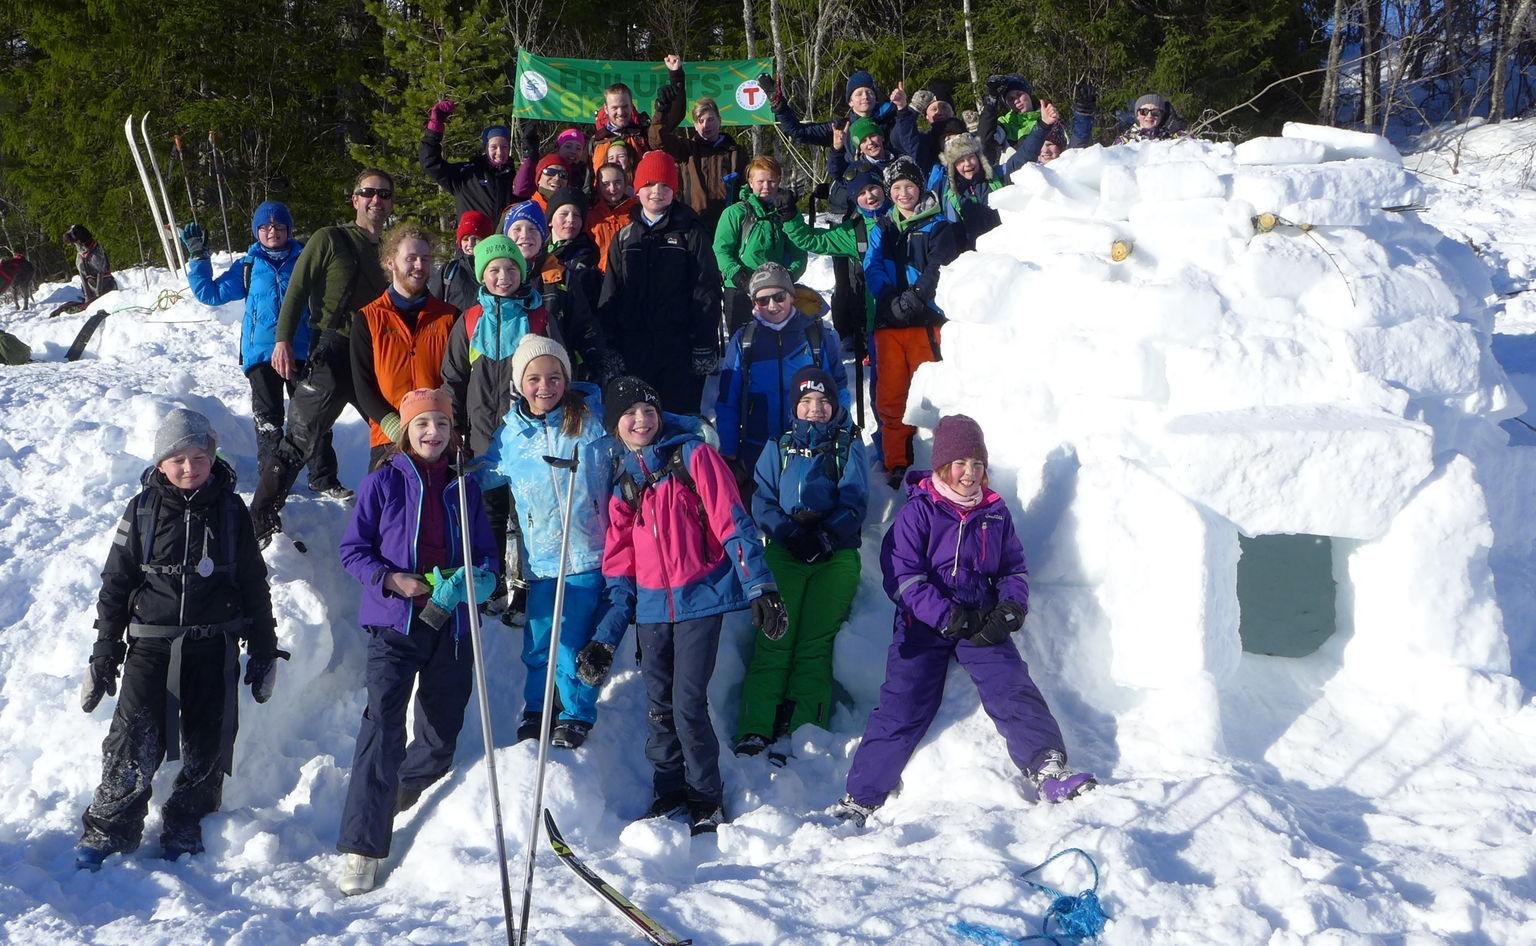 Stikkut Bli Med På Friluftsskole På Skaret I Vinterferien 2019